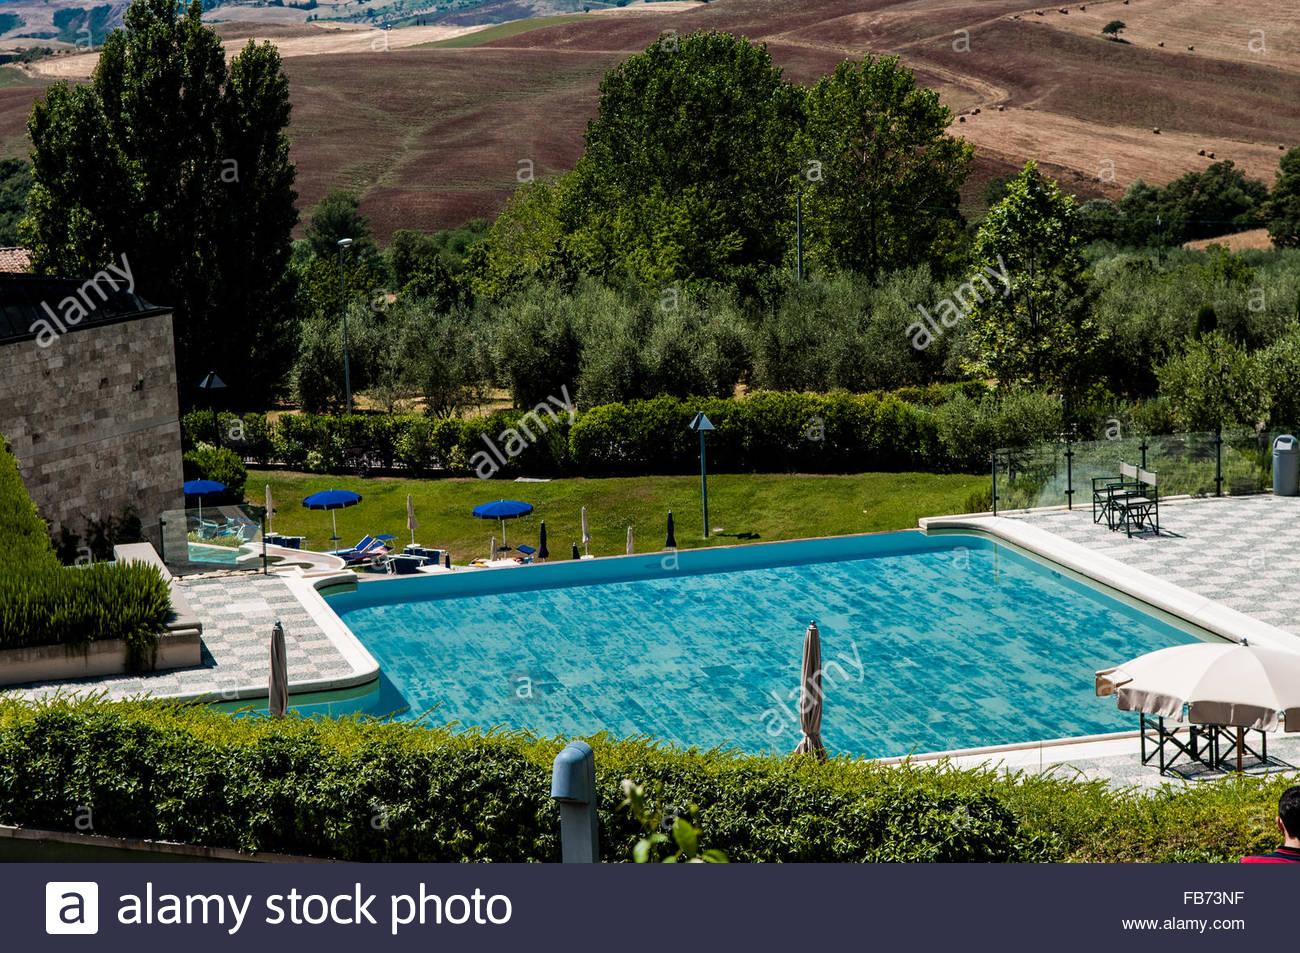 Pool, Fonteverde Terme, San Casciano dei Bagni, Italien Stockfoto ...